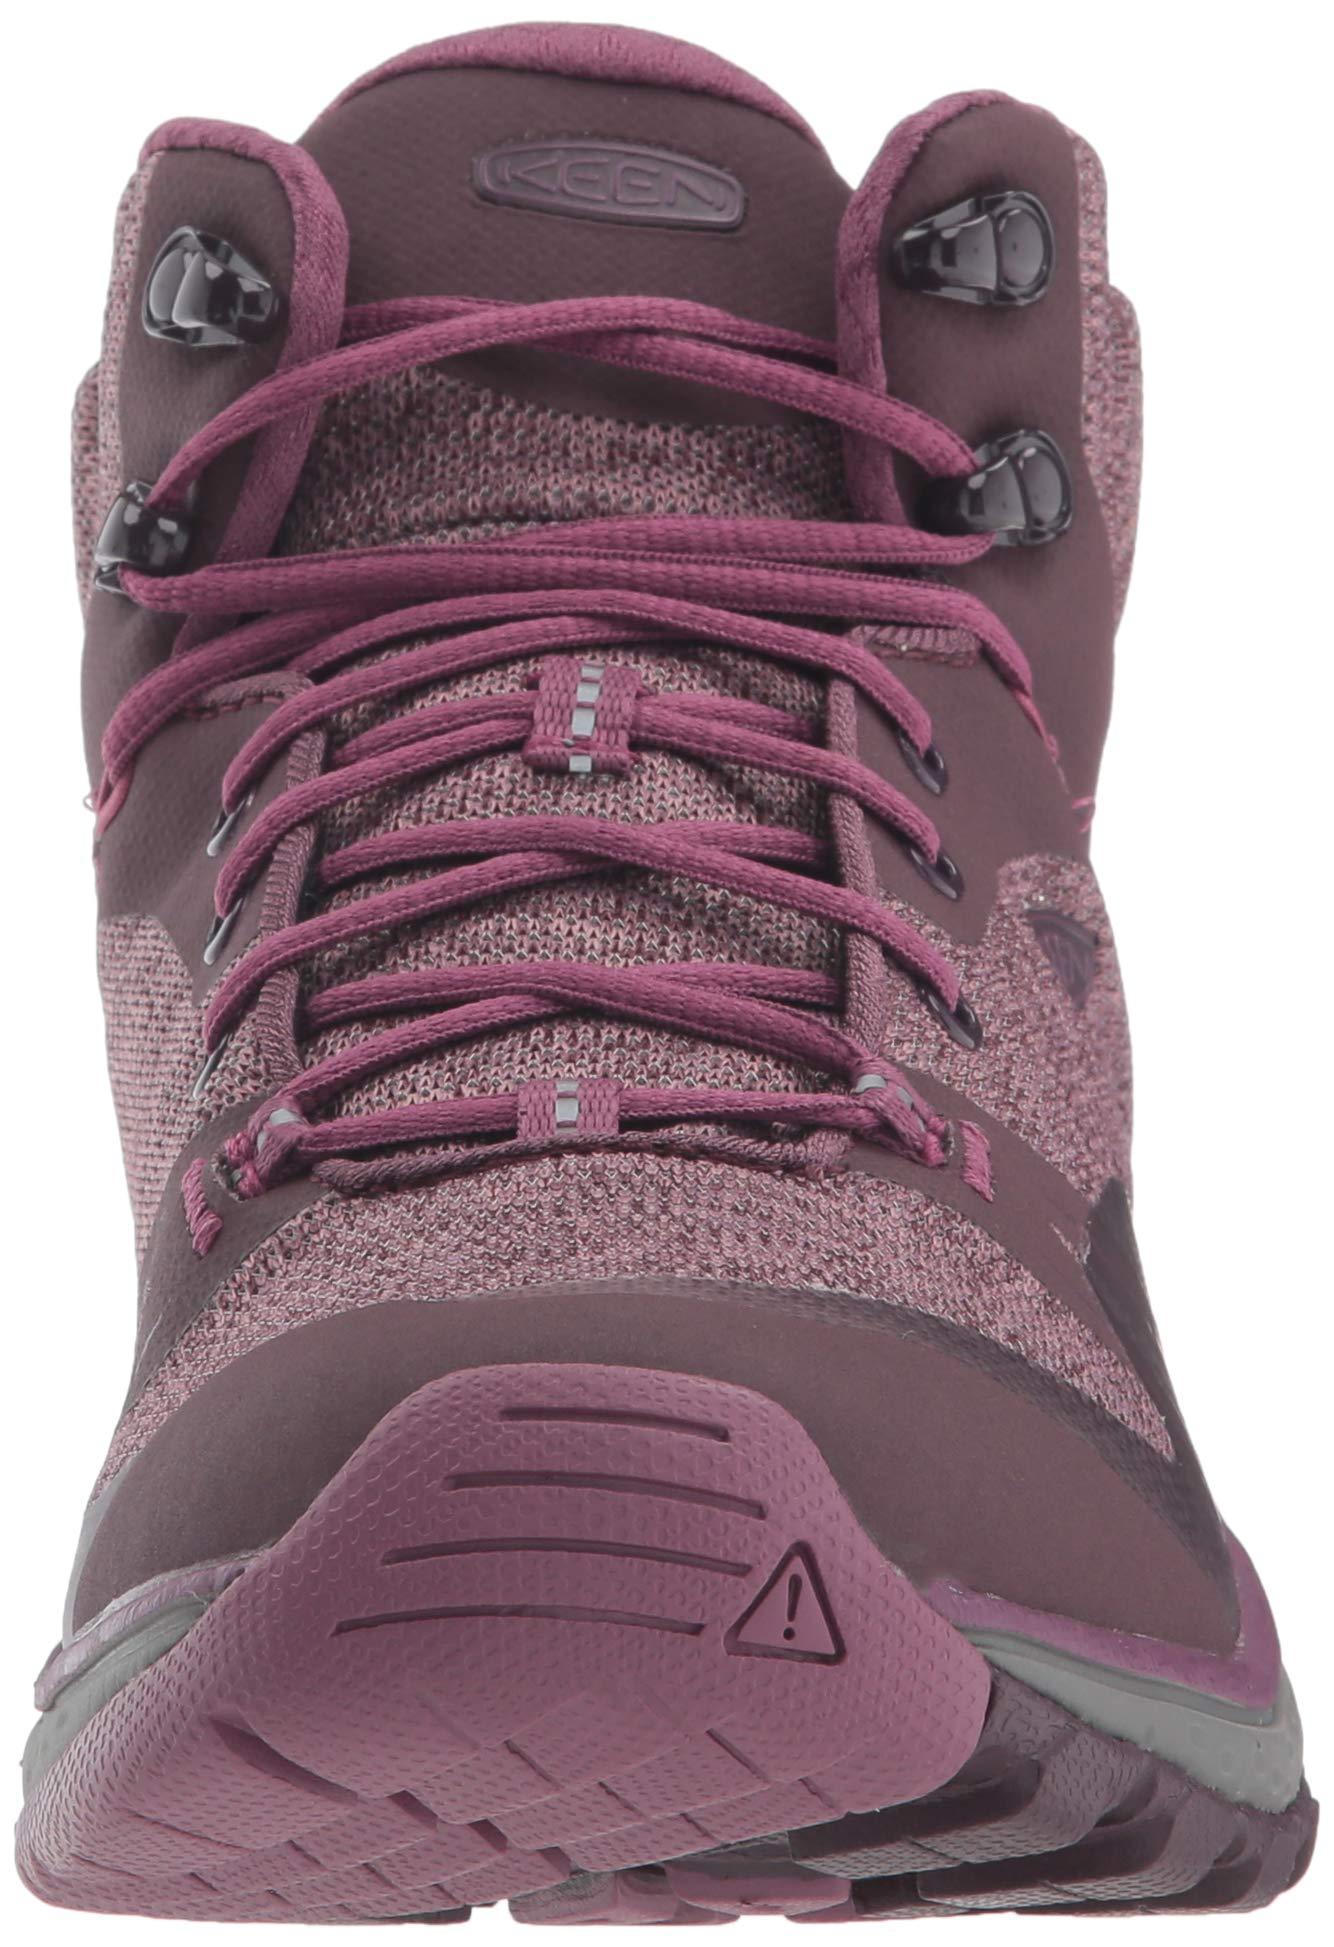 KEEN Women's Terradora Mid Wp High Rise Hiking Shoes, 9